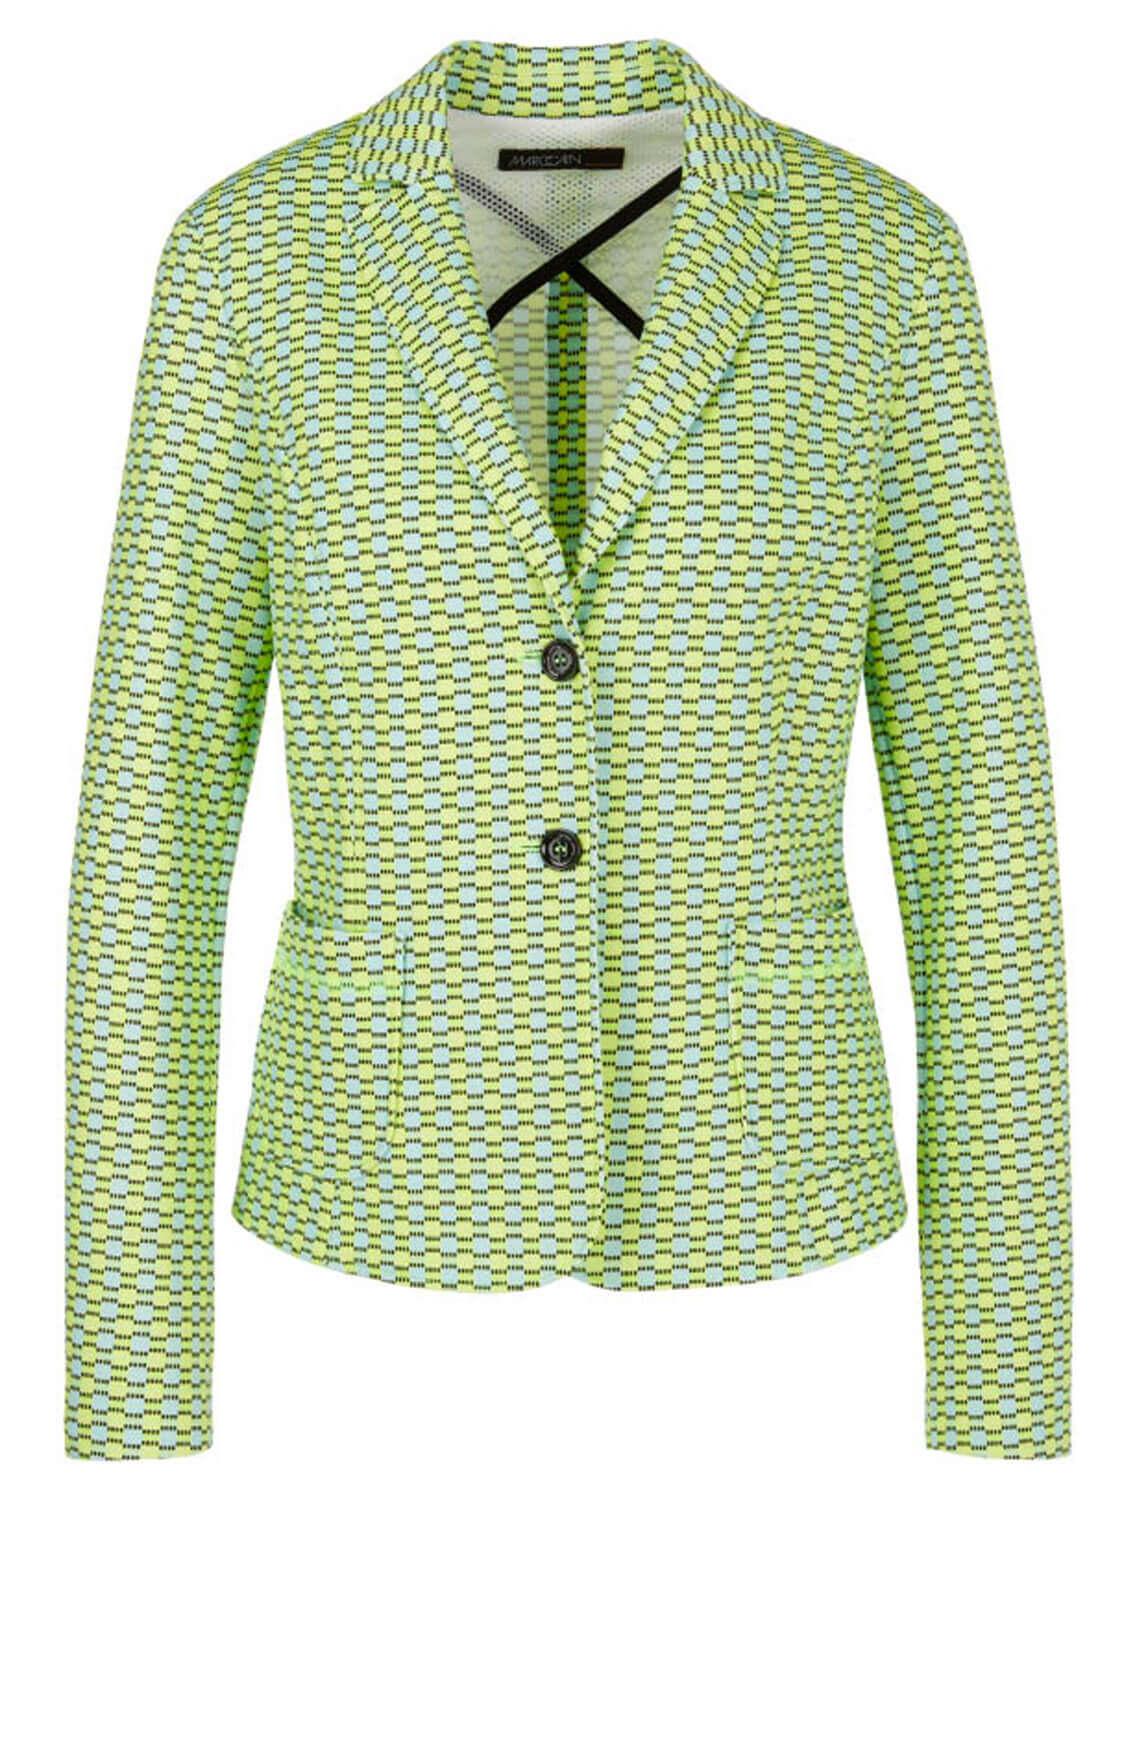 Marccain Sports Dames Blazer met print groen